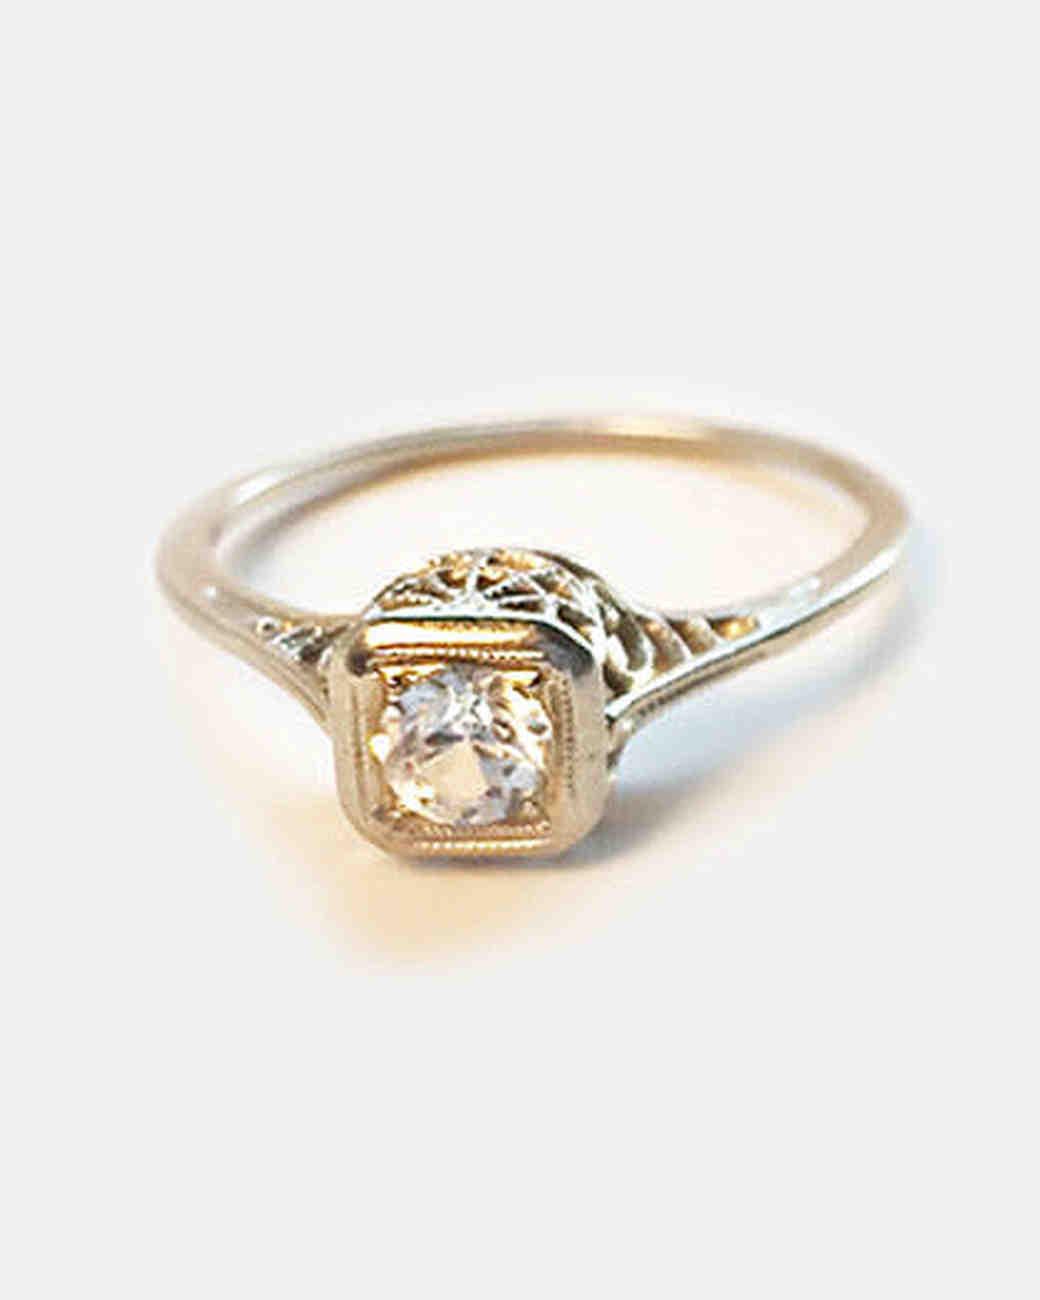 Stone Fox Bride antique diamond engagement ring